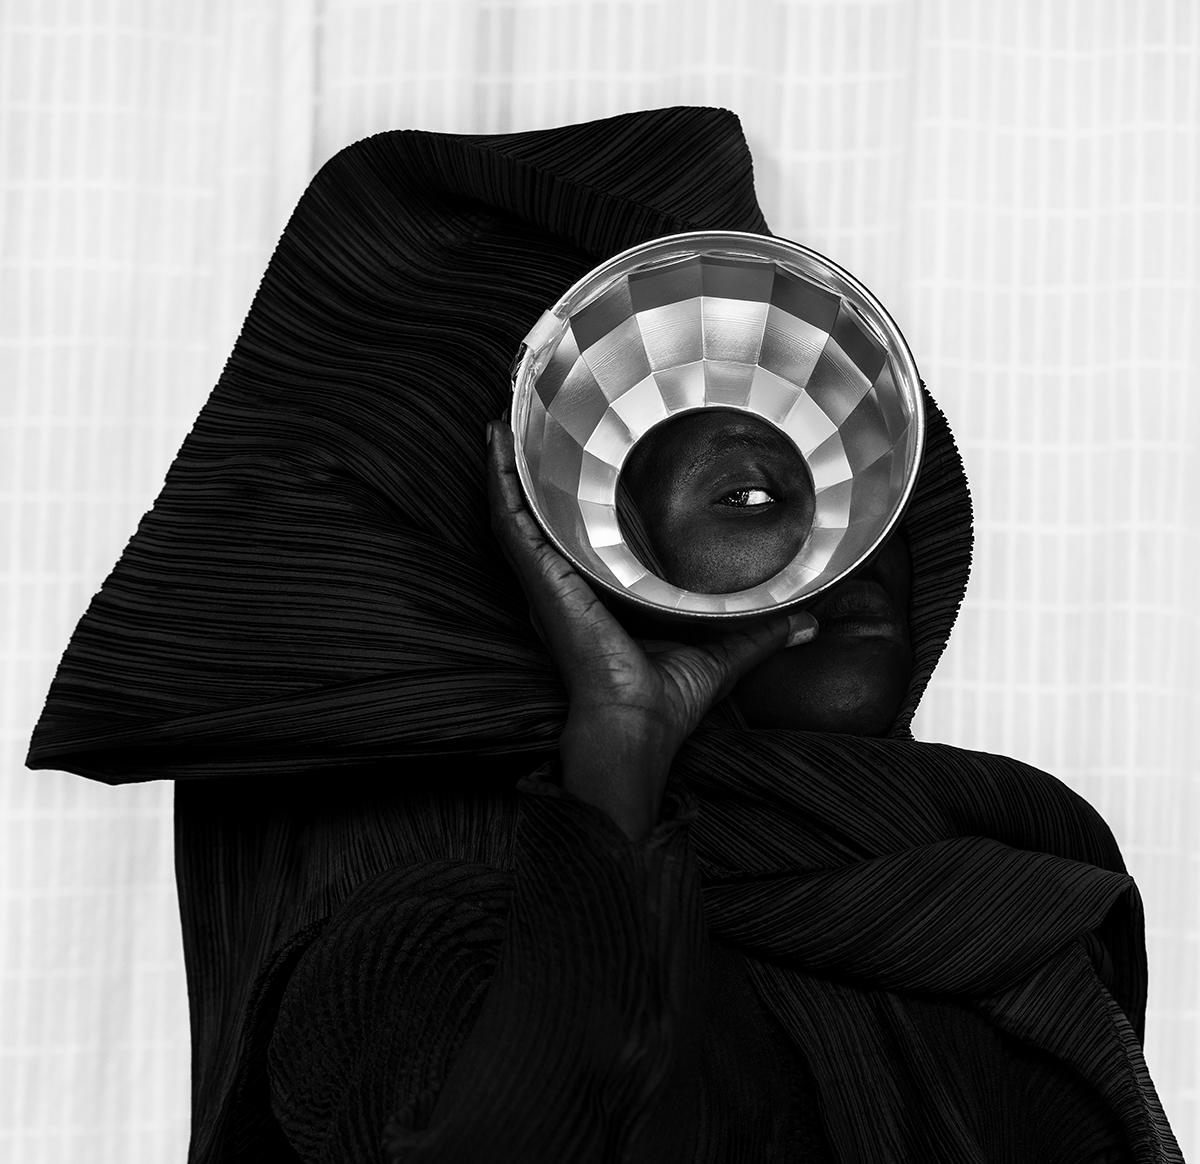 Zanele Muholi - Bester IX, Philadelphia, 2018, 2018